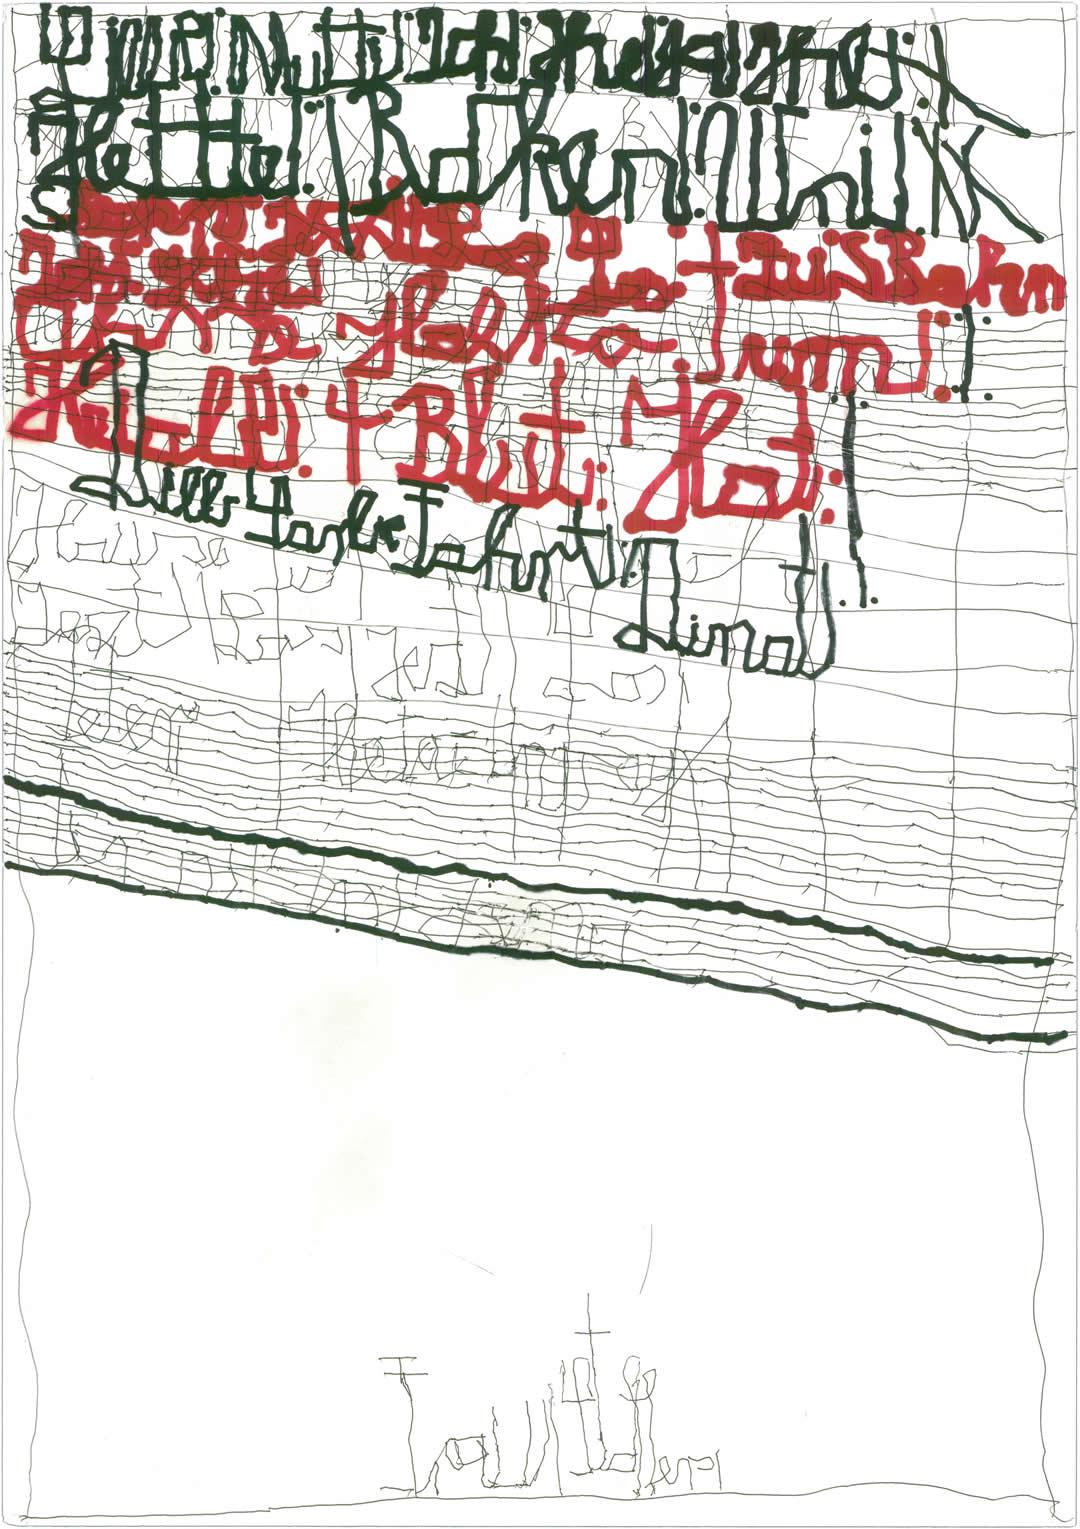 Harald Stoffers | Brief405 2018 | 59x42cm | viennacontemporary | Galerie3